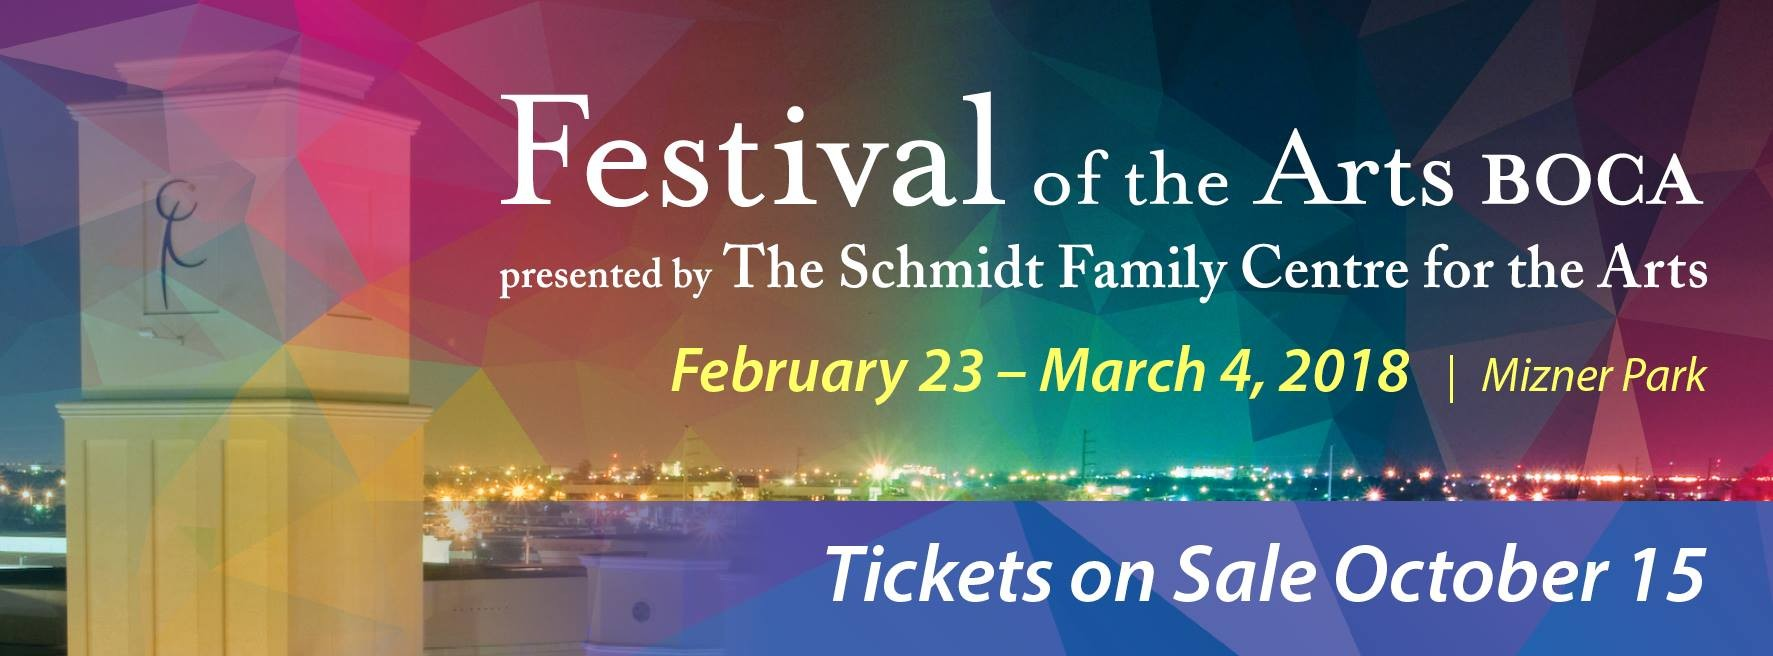 Festival Of The Arts Boca Linkedin